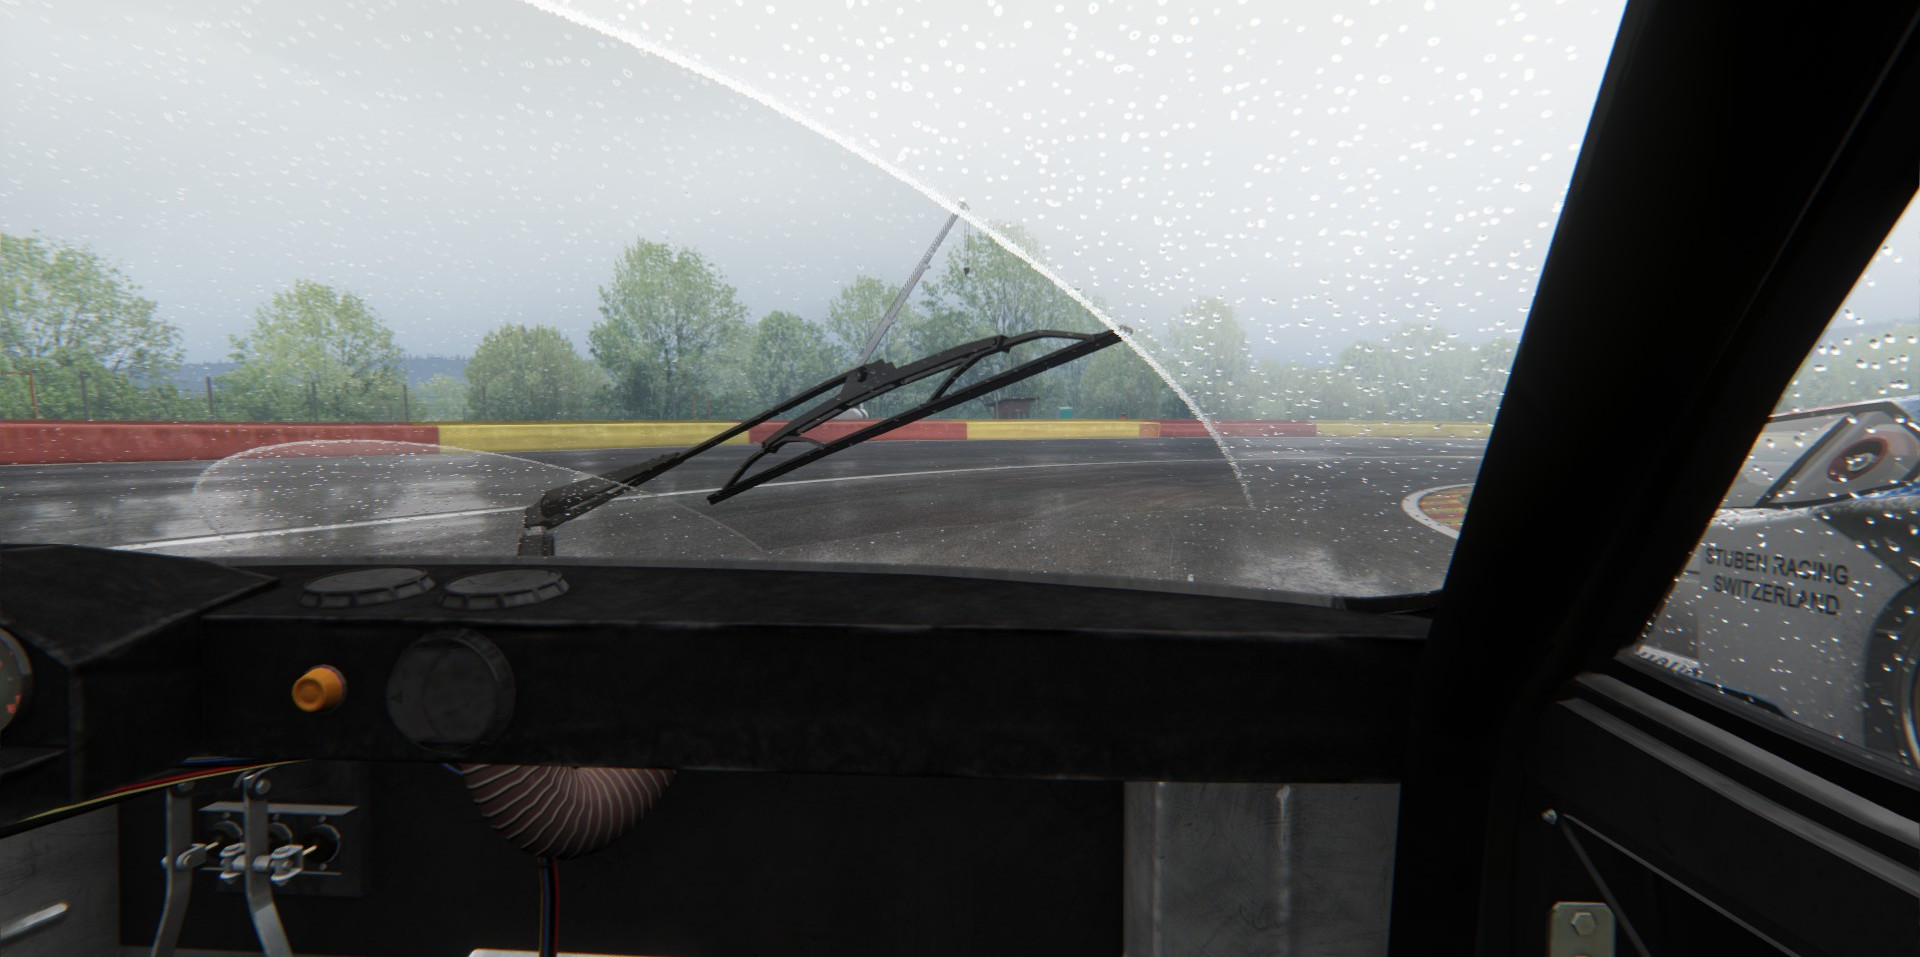 Rain ( Shader Patch )